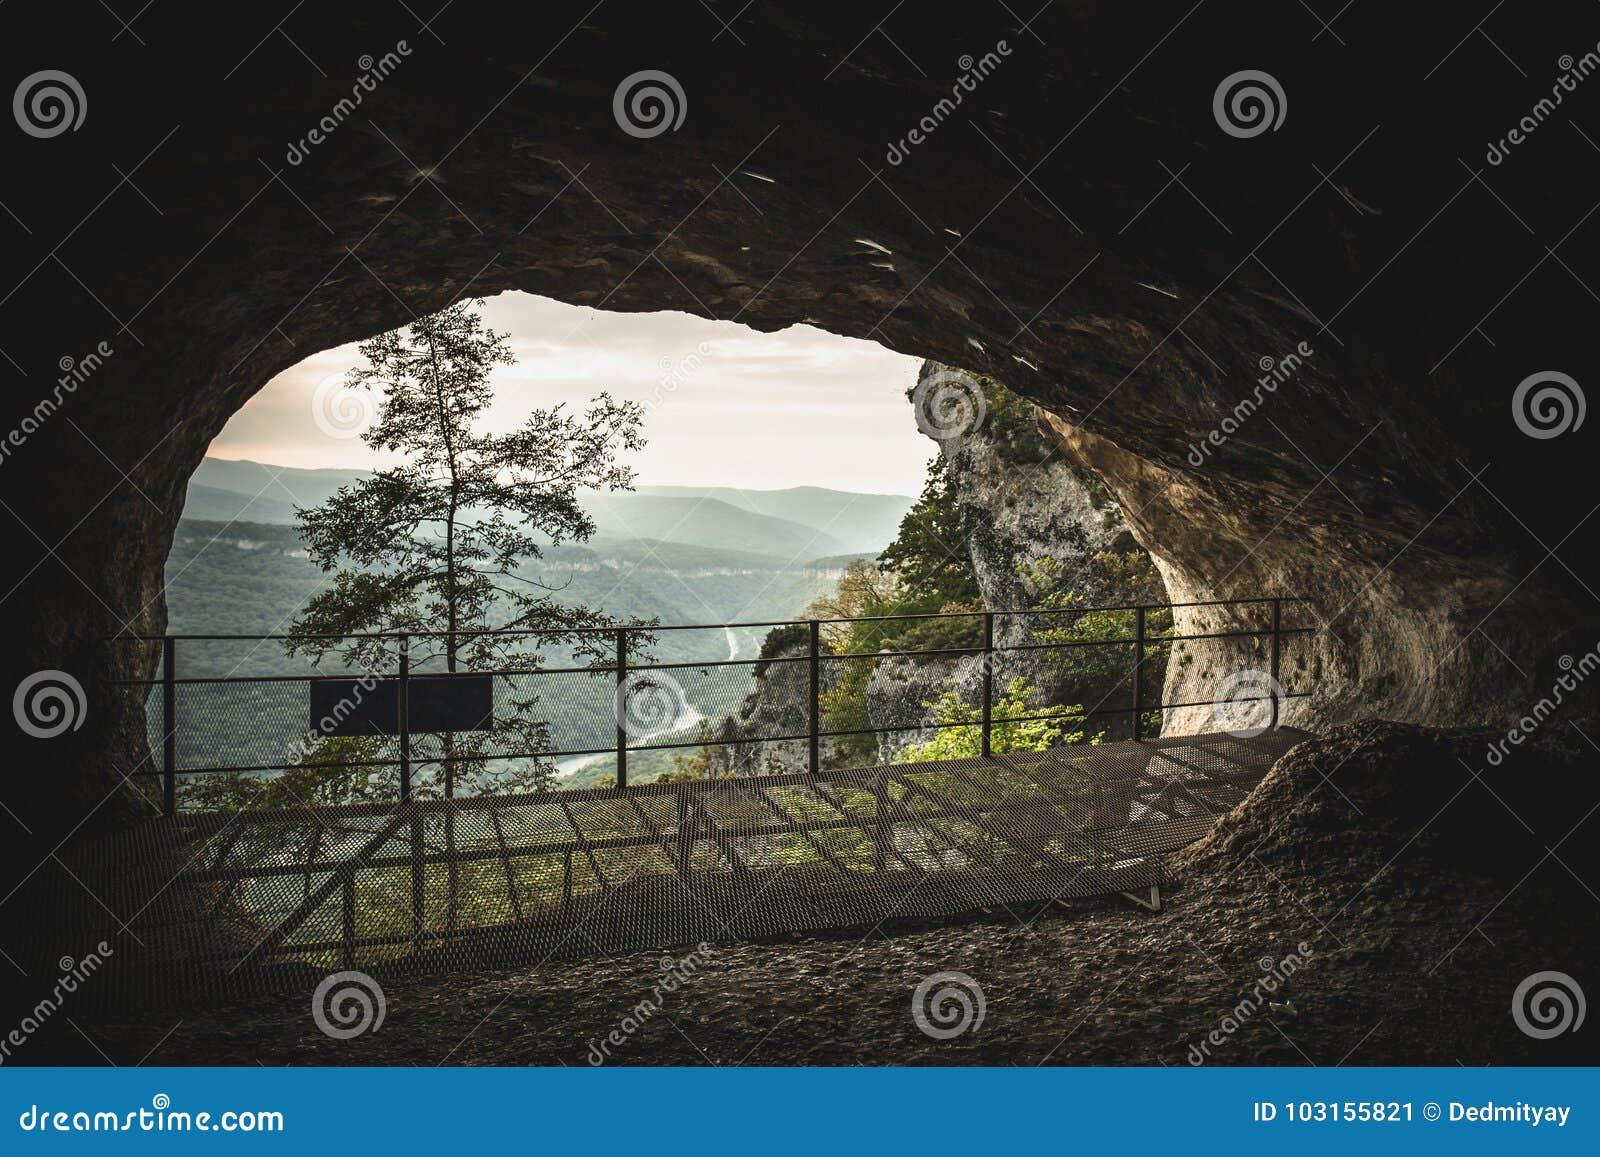 Glory hole mountain cave